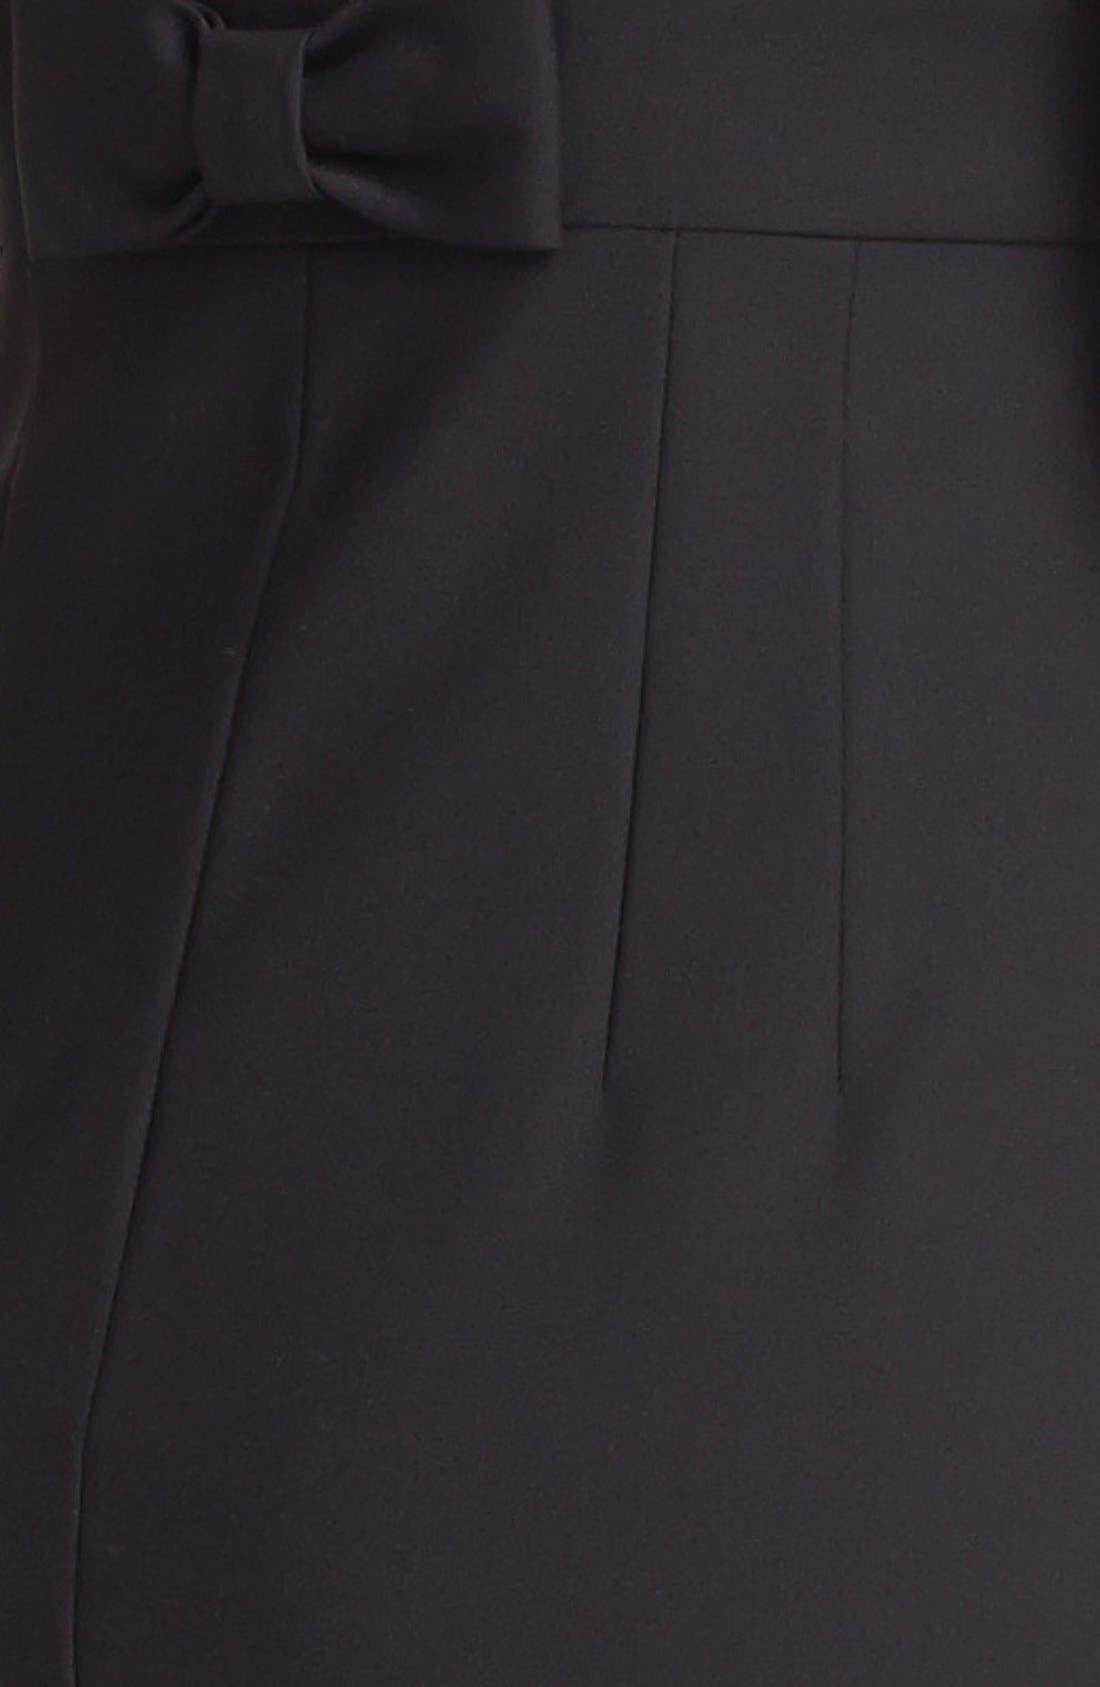 KATE SPADE NEW YORK,                             'joyann' sleeveless dress,                             Alternate thumbnail 2, color,                             001